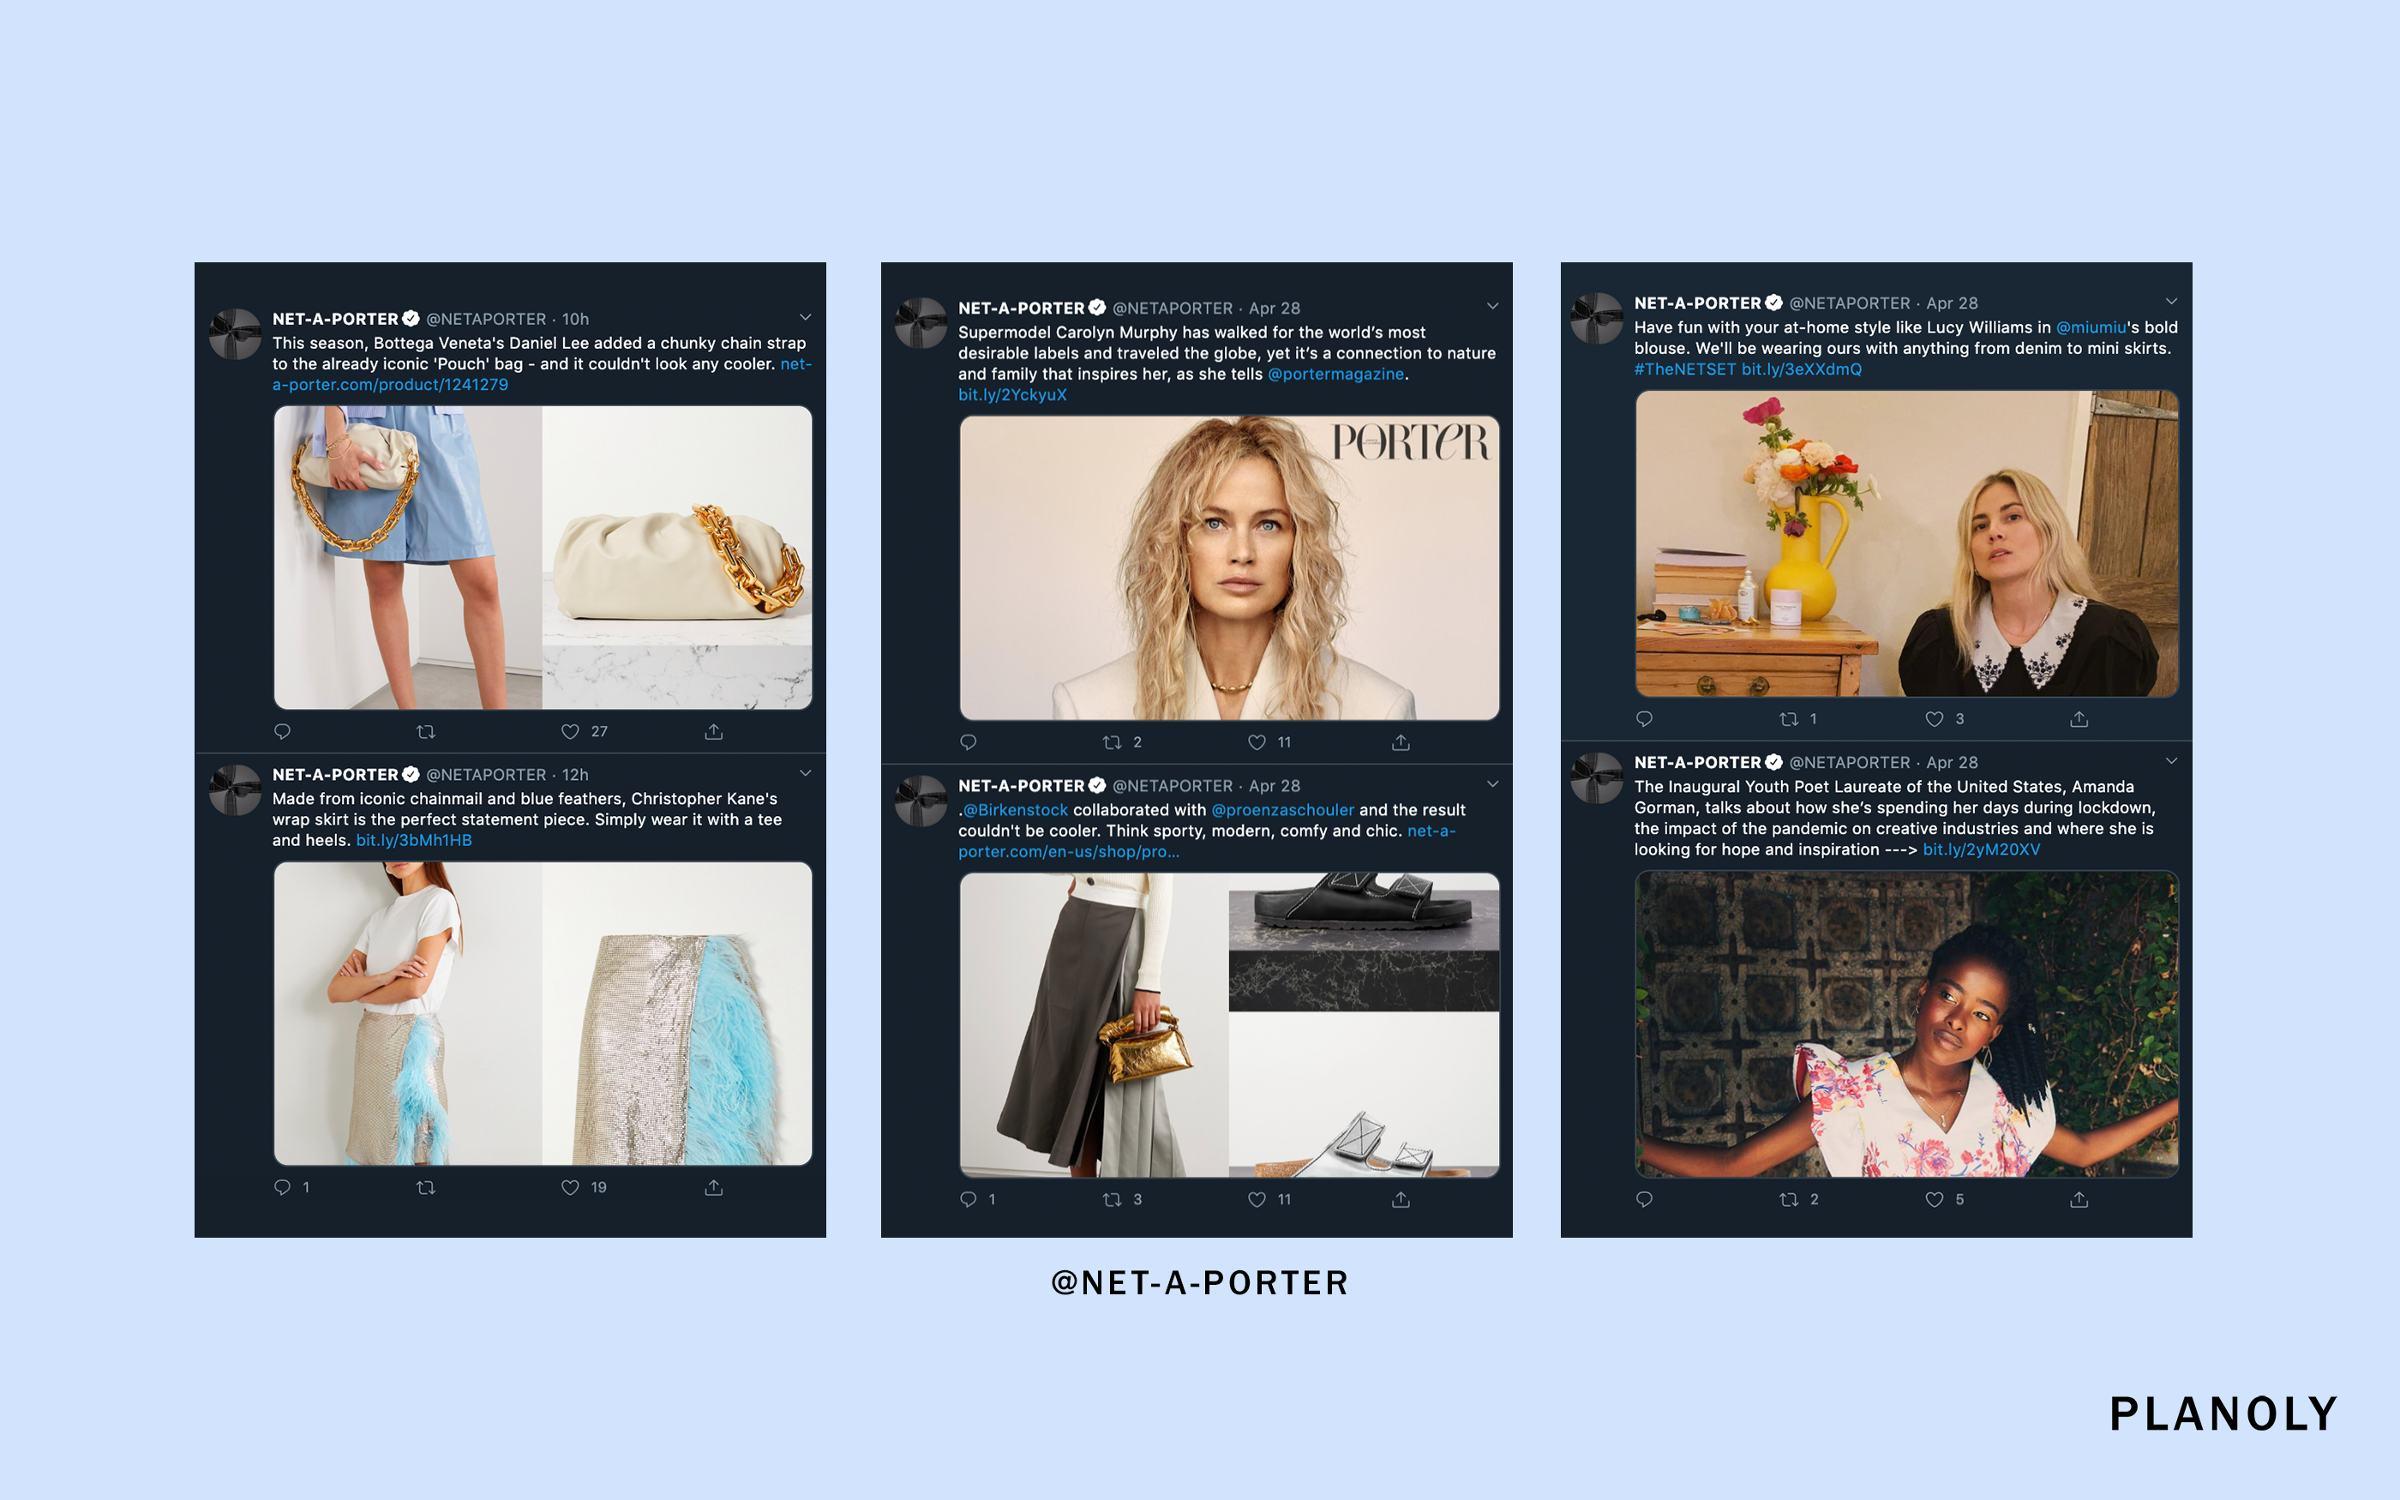 PLANOLY-Blog-Post-Twitter-Marketing-Strategies-Image-6